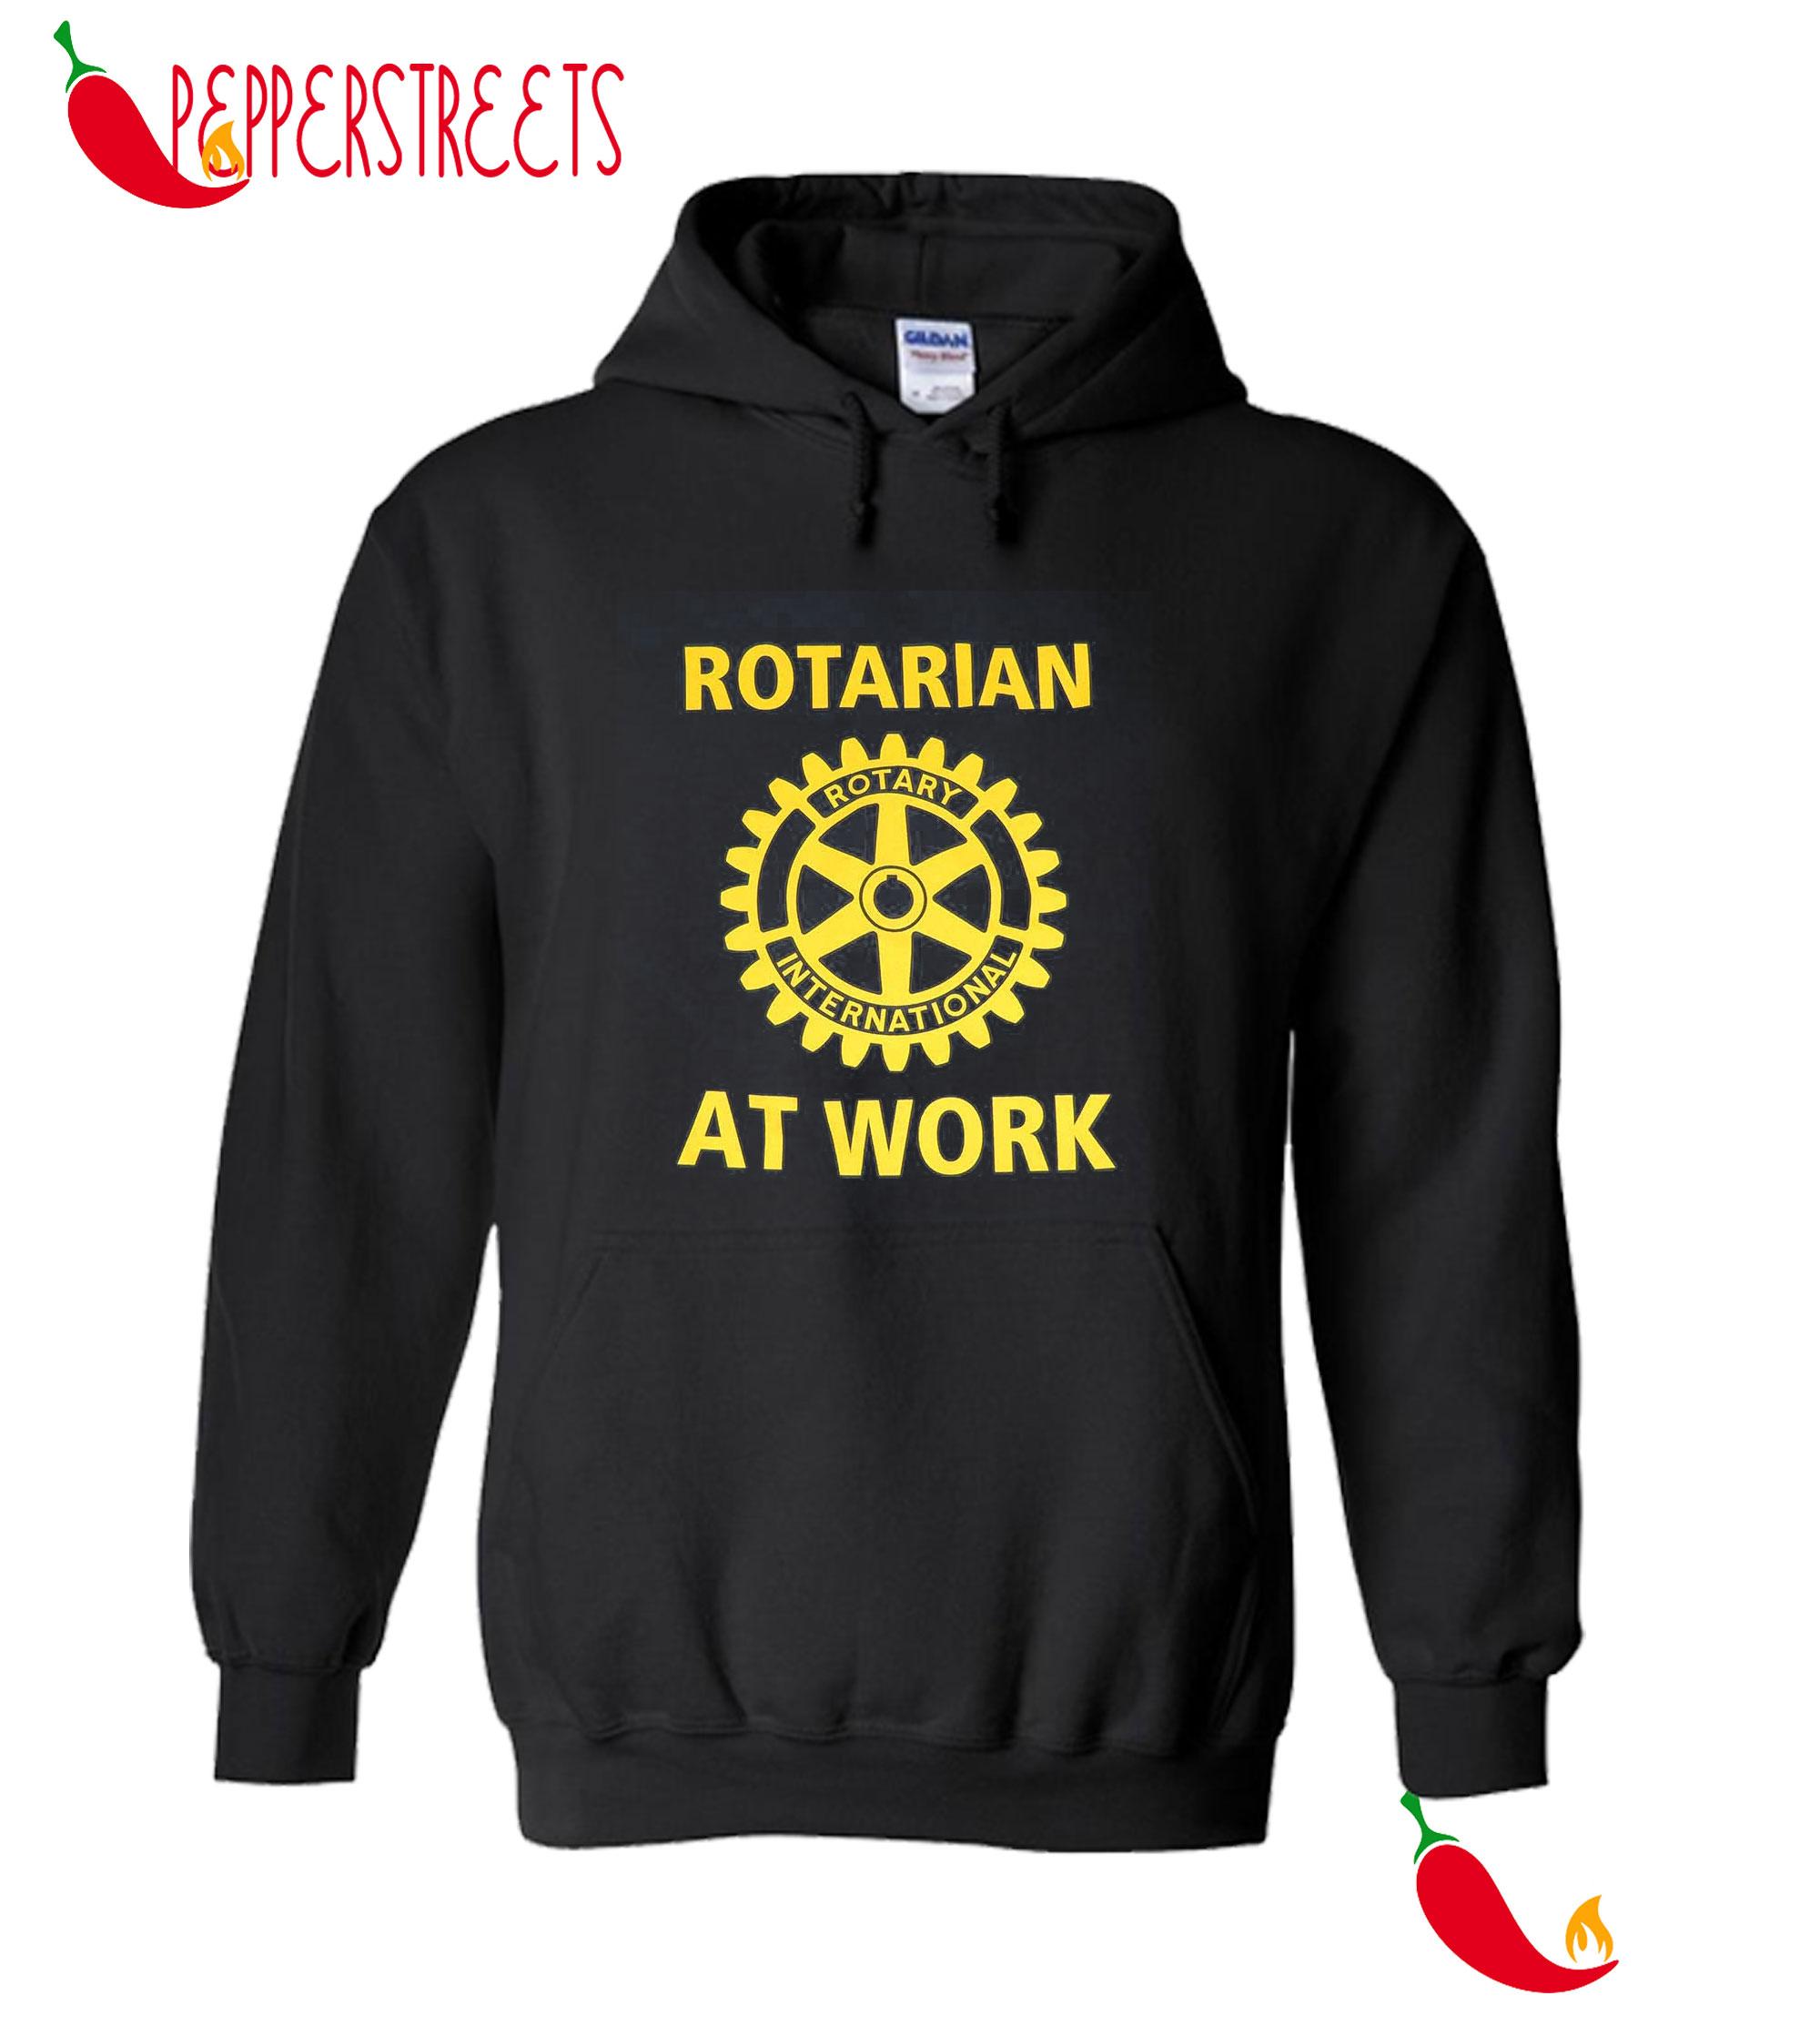 Rotarian Rotary International At Work Hoodie